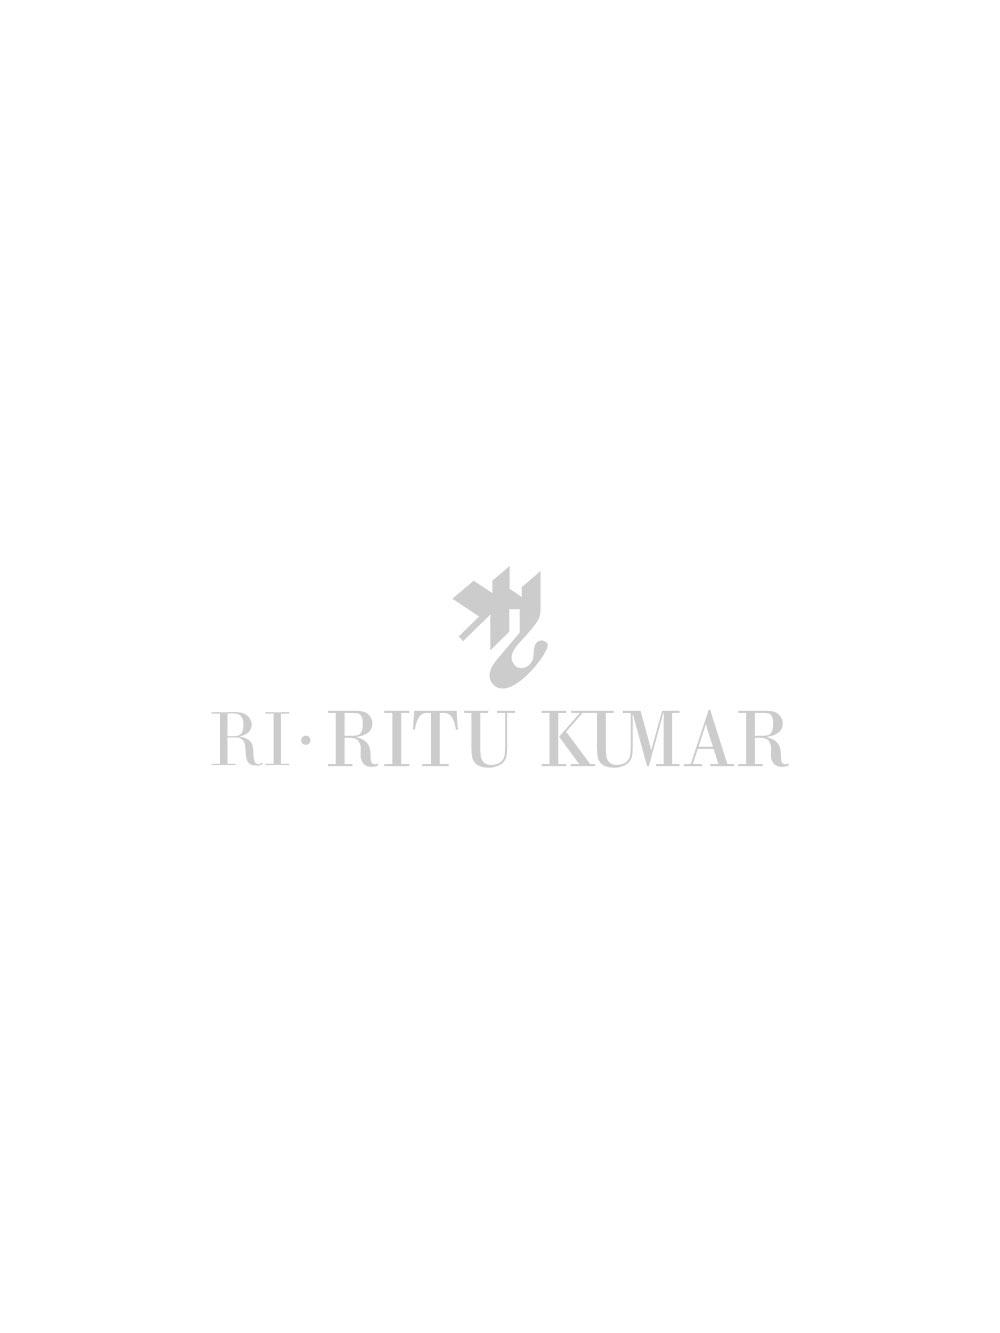 Beige & Black Embroidered Kurta With Dupatta And Churidar